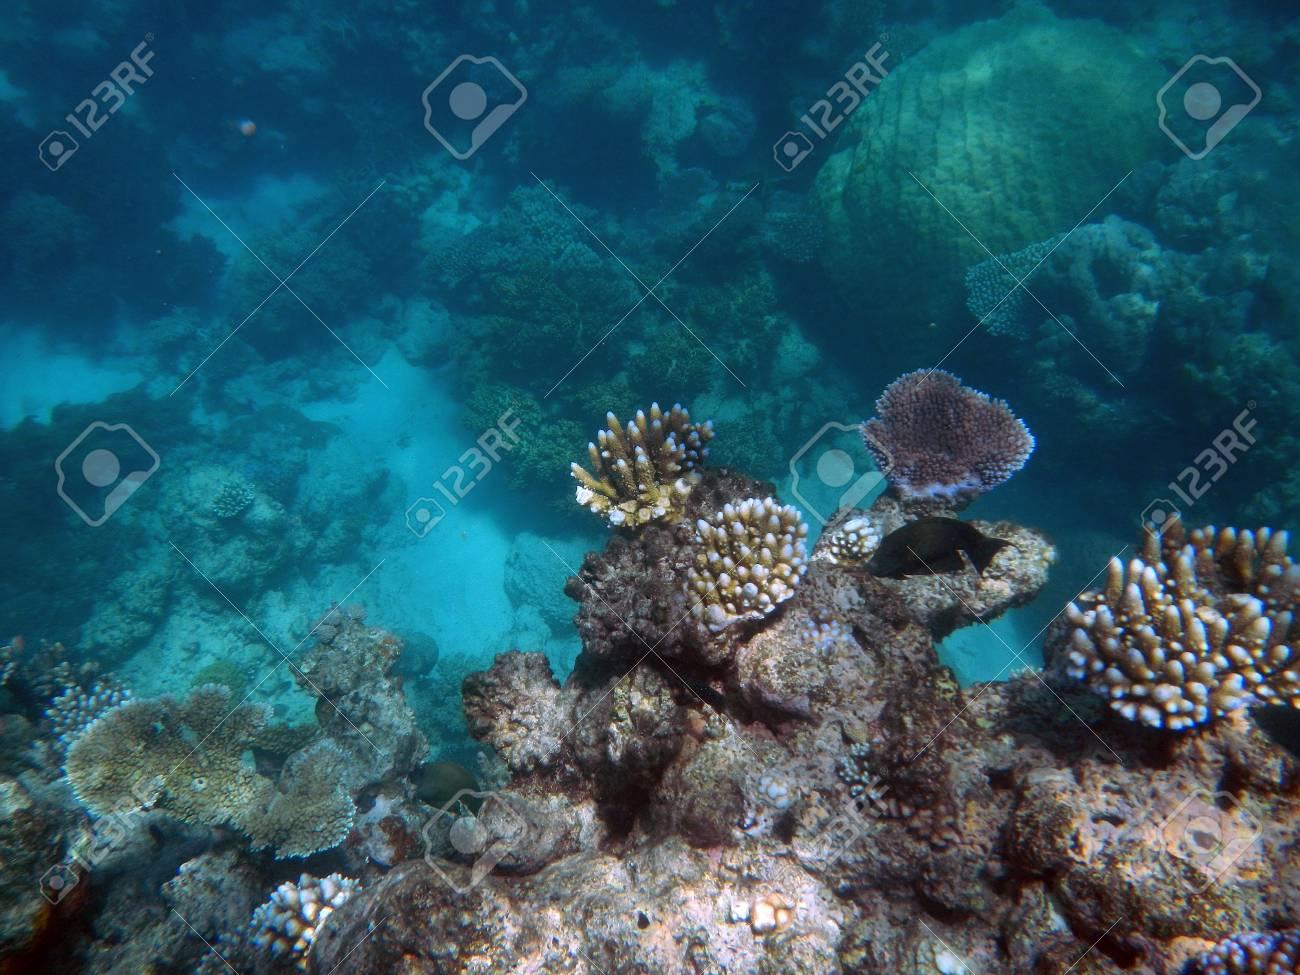 Snorkeling on the Great Barrier Reef, Australia - 122092441